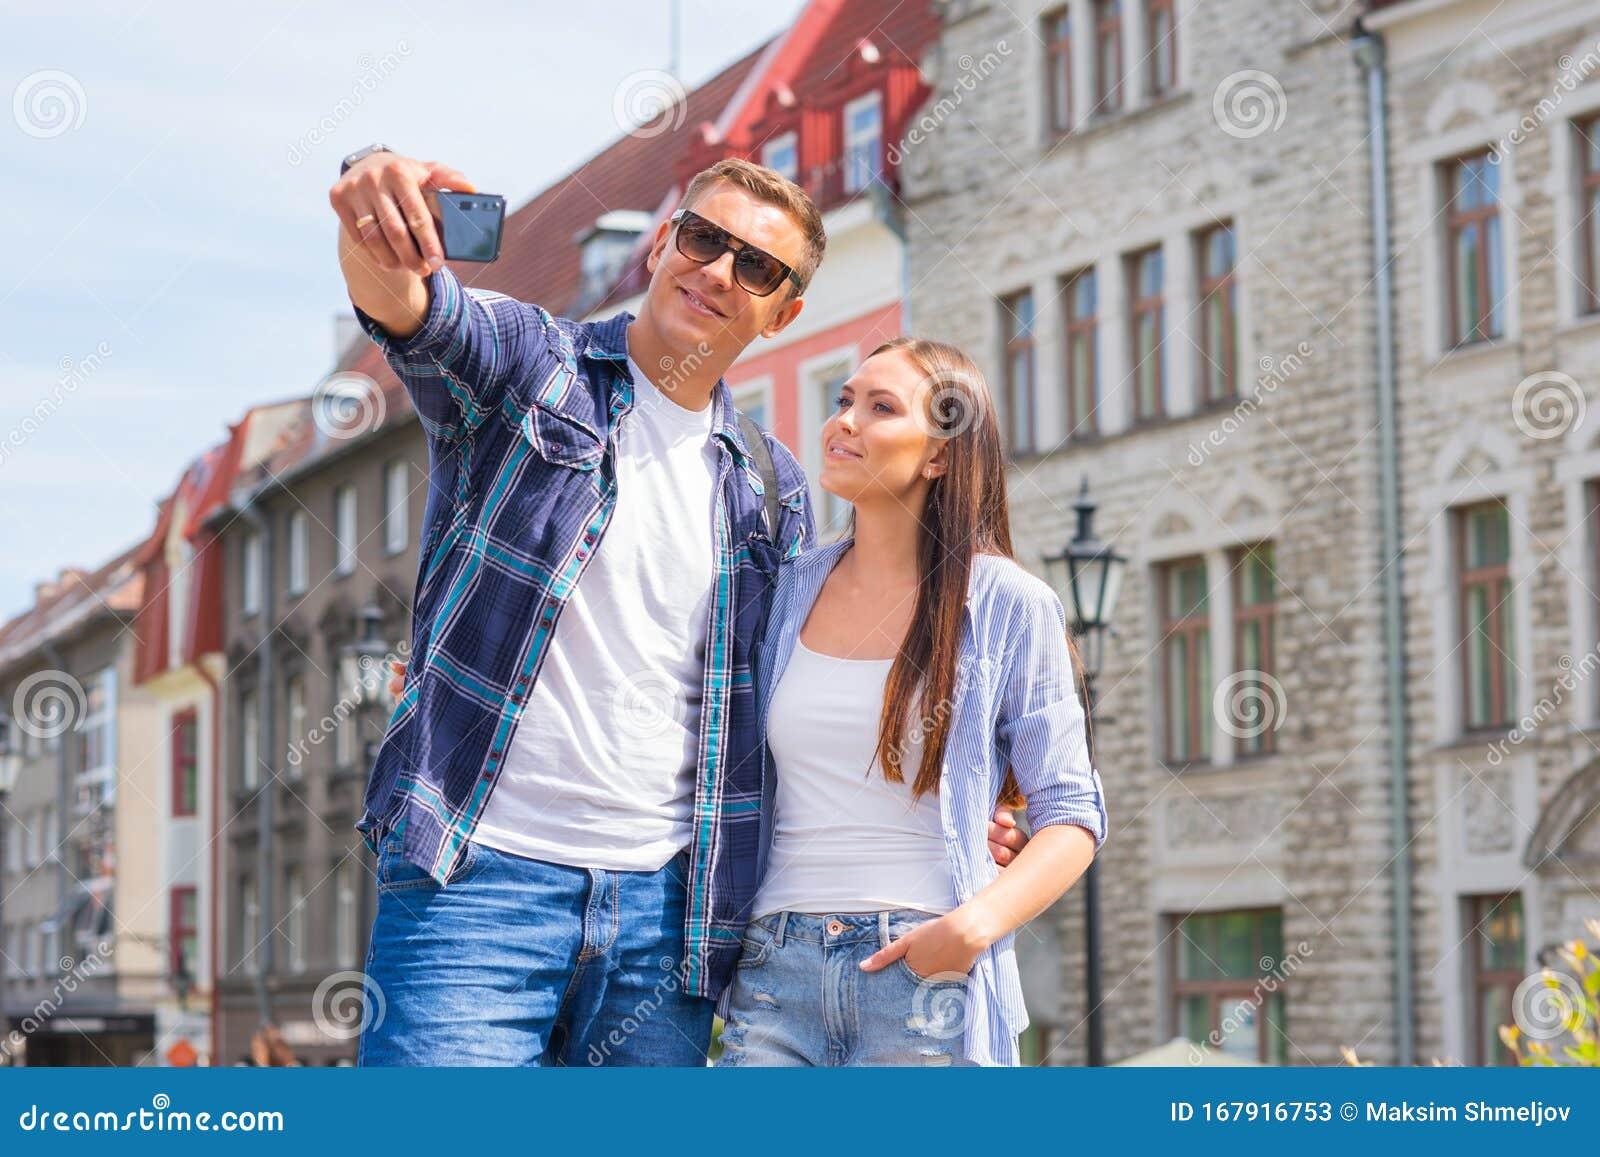 Oldtown catholic single men Encounter Dating April 2020